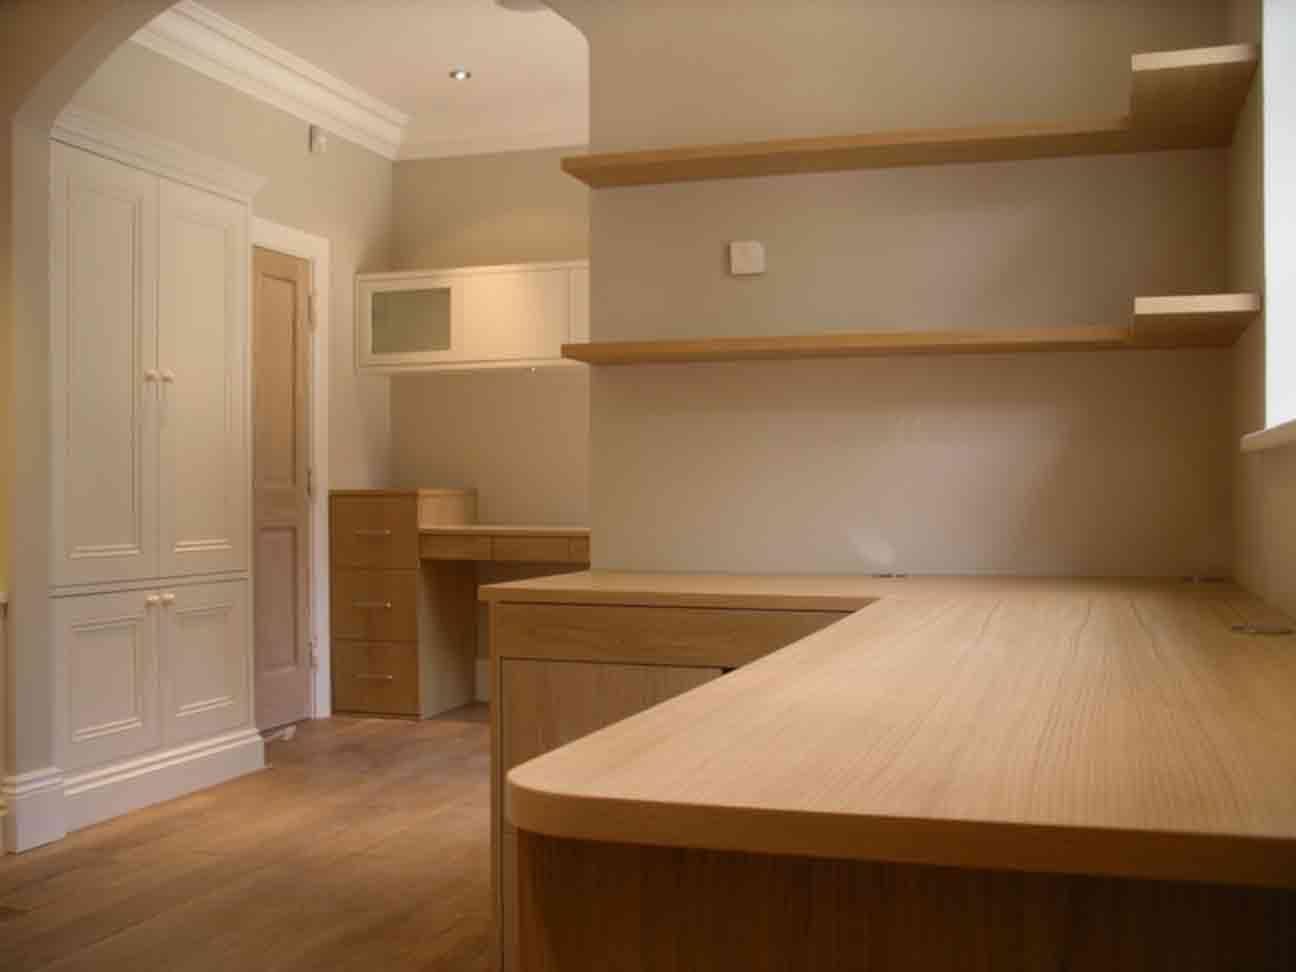 Bespoke Studies Peter Henderson Furniture Brighton Uk Intended For Bespoke Built In Furniture (View 10 of 15)